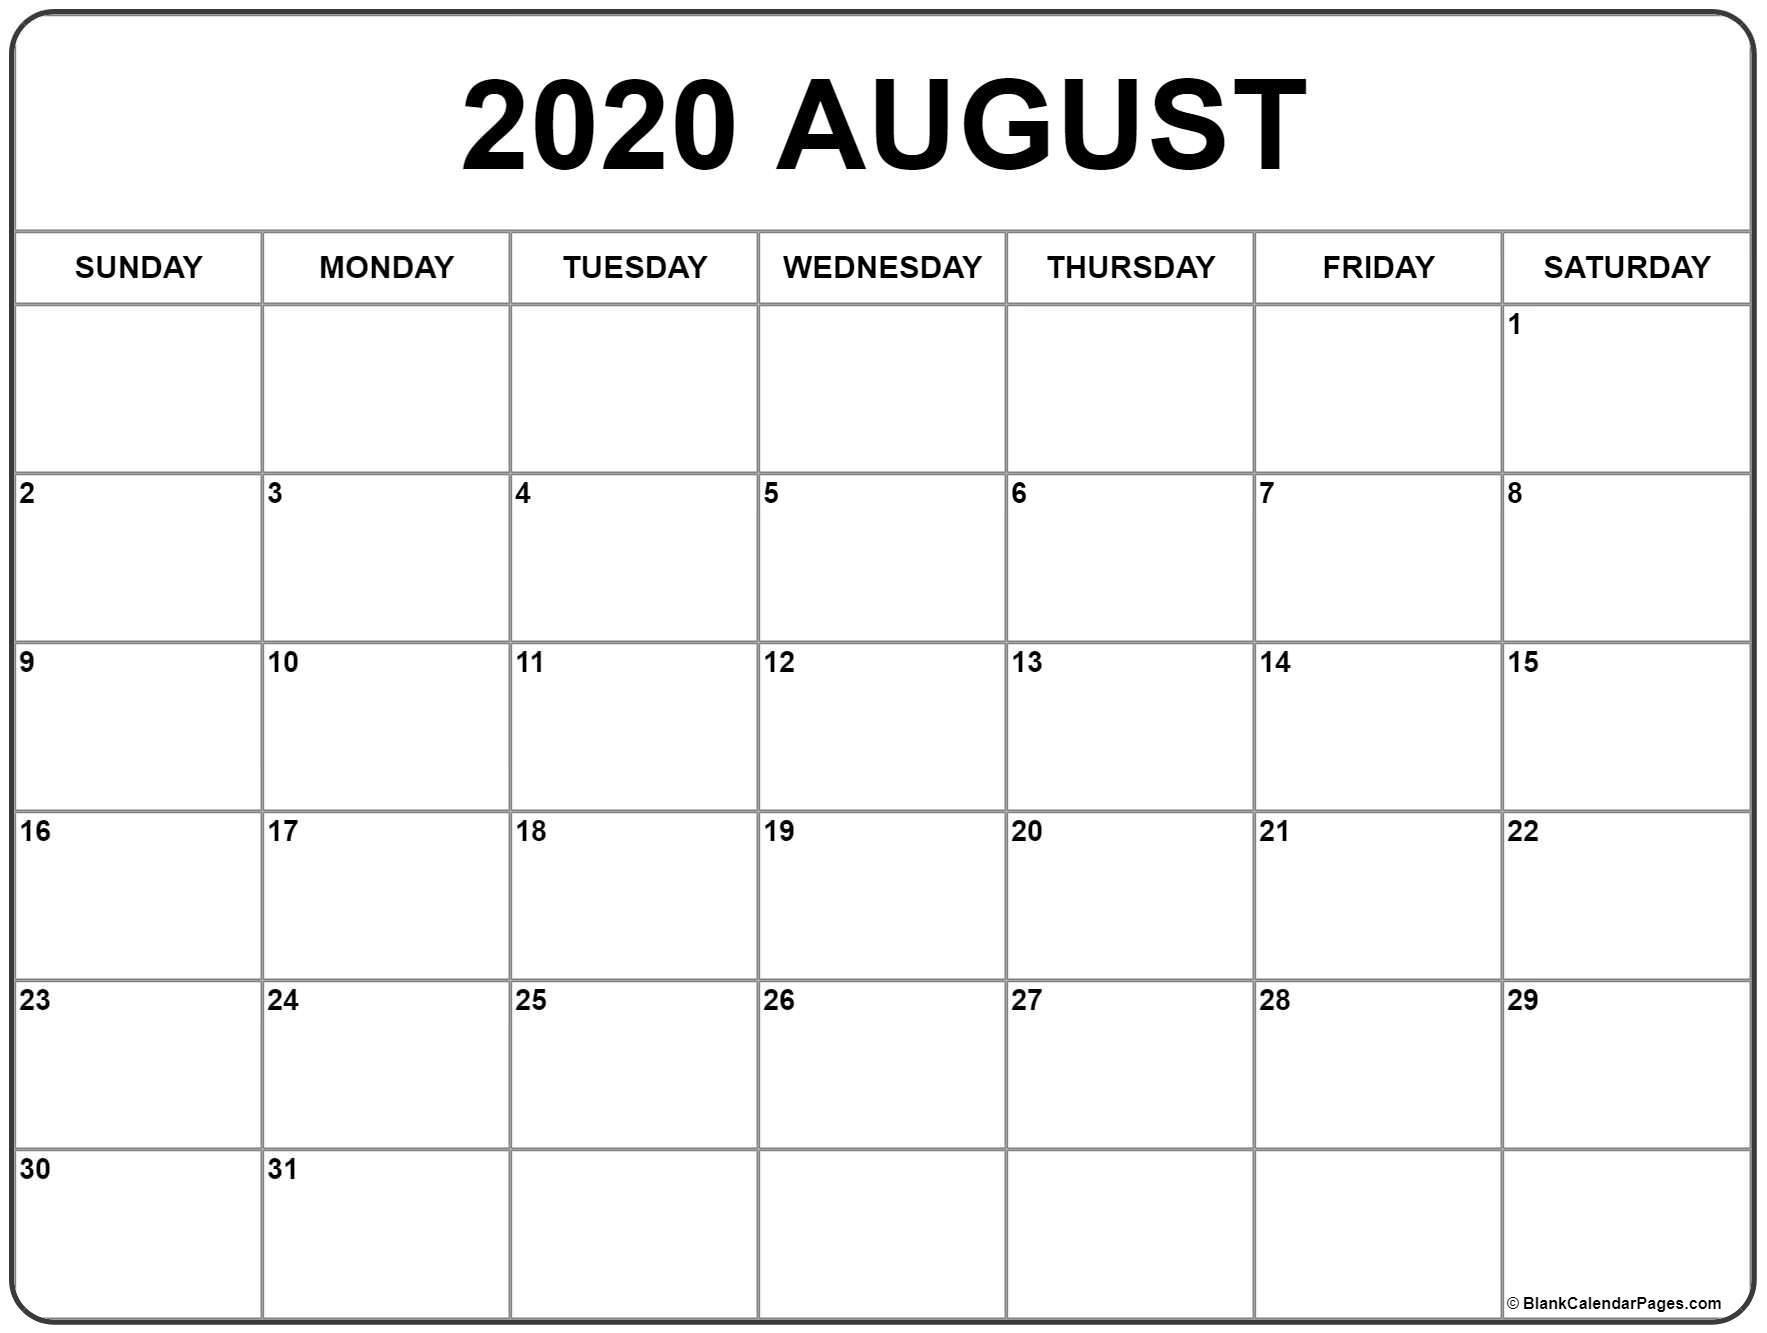 Calendar Aug 2020-Free Monthly Holiday Themed Calendar Printable 2020-2020